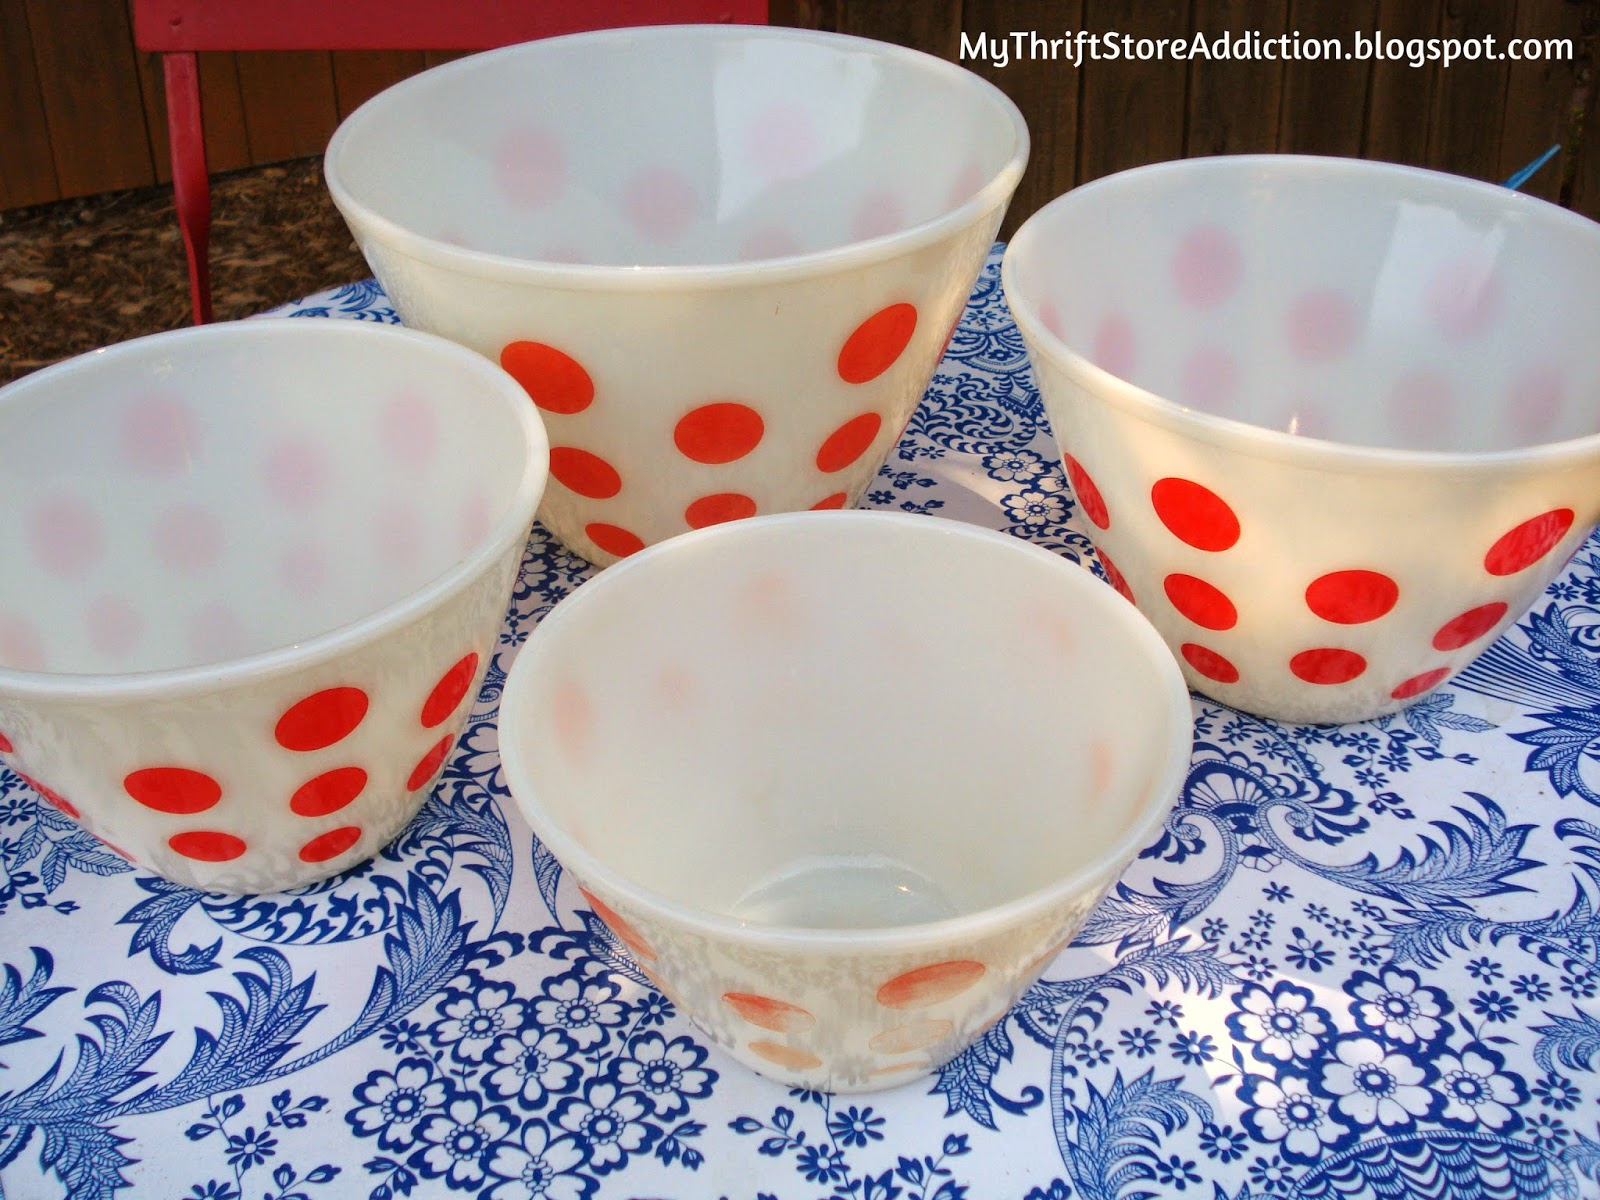 Fire King Dots Bowls